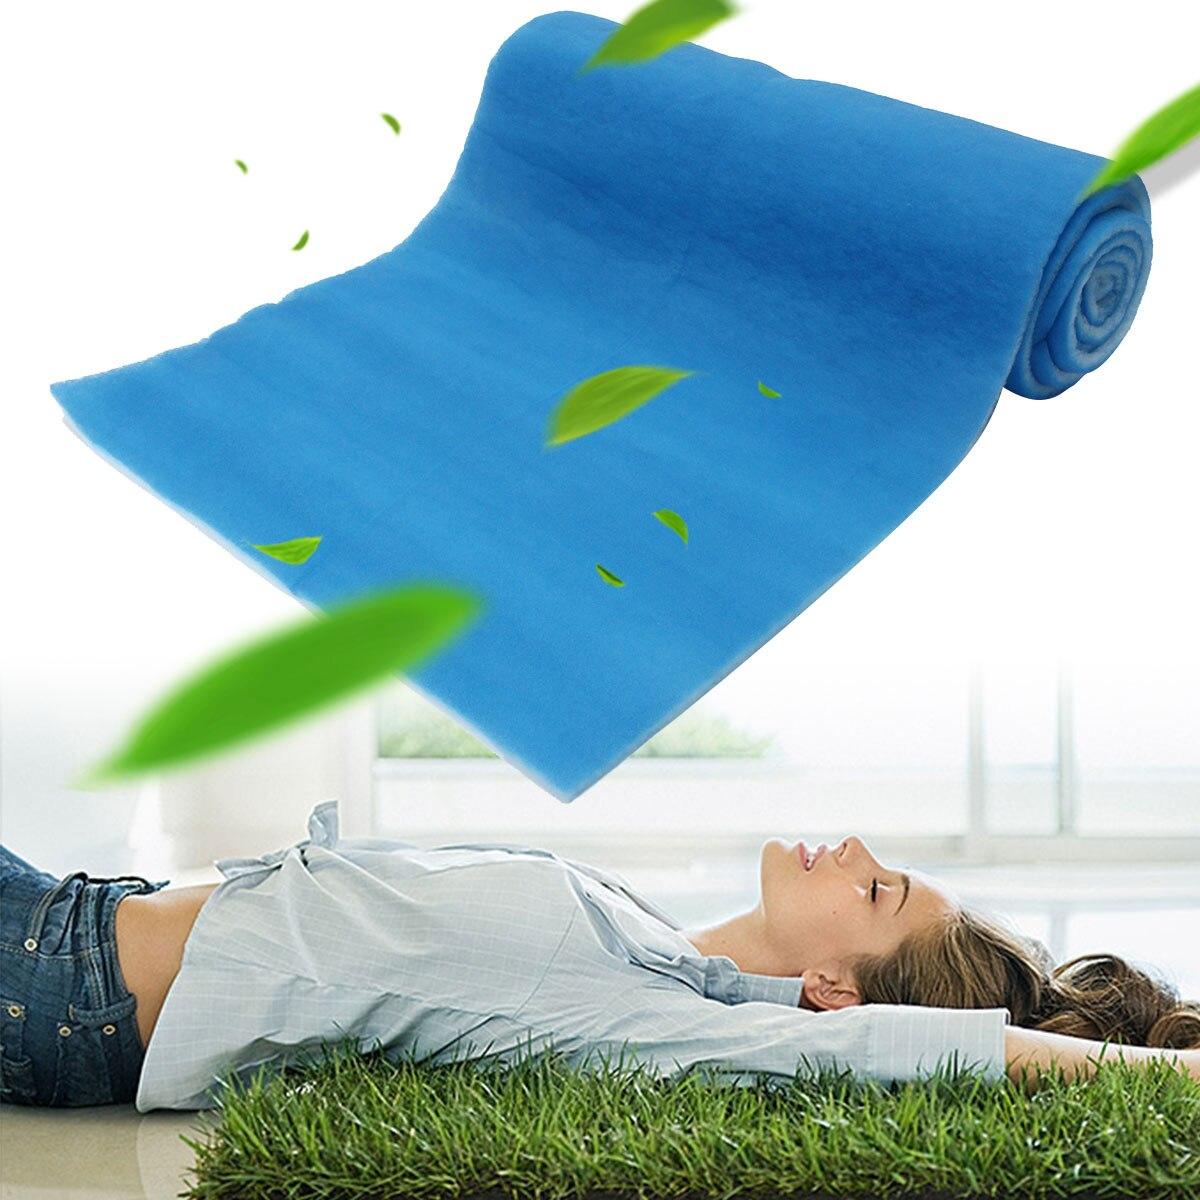 1 Roll 5M Polyester Fiber Air Filter Heat Resistant Air Filter Foam Filter Sponge Material Waterproof Paint Shop Car Spray Boot